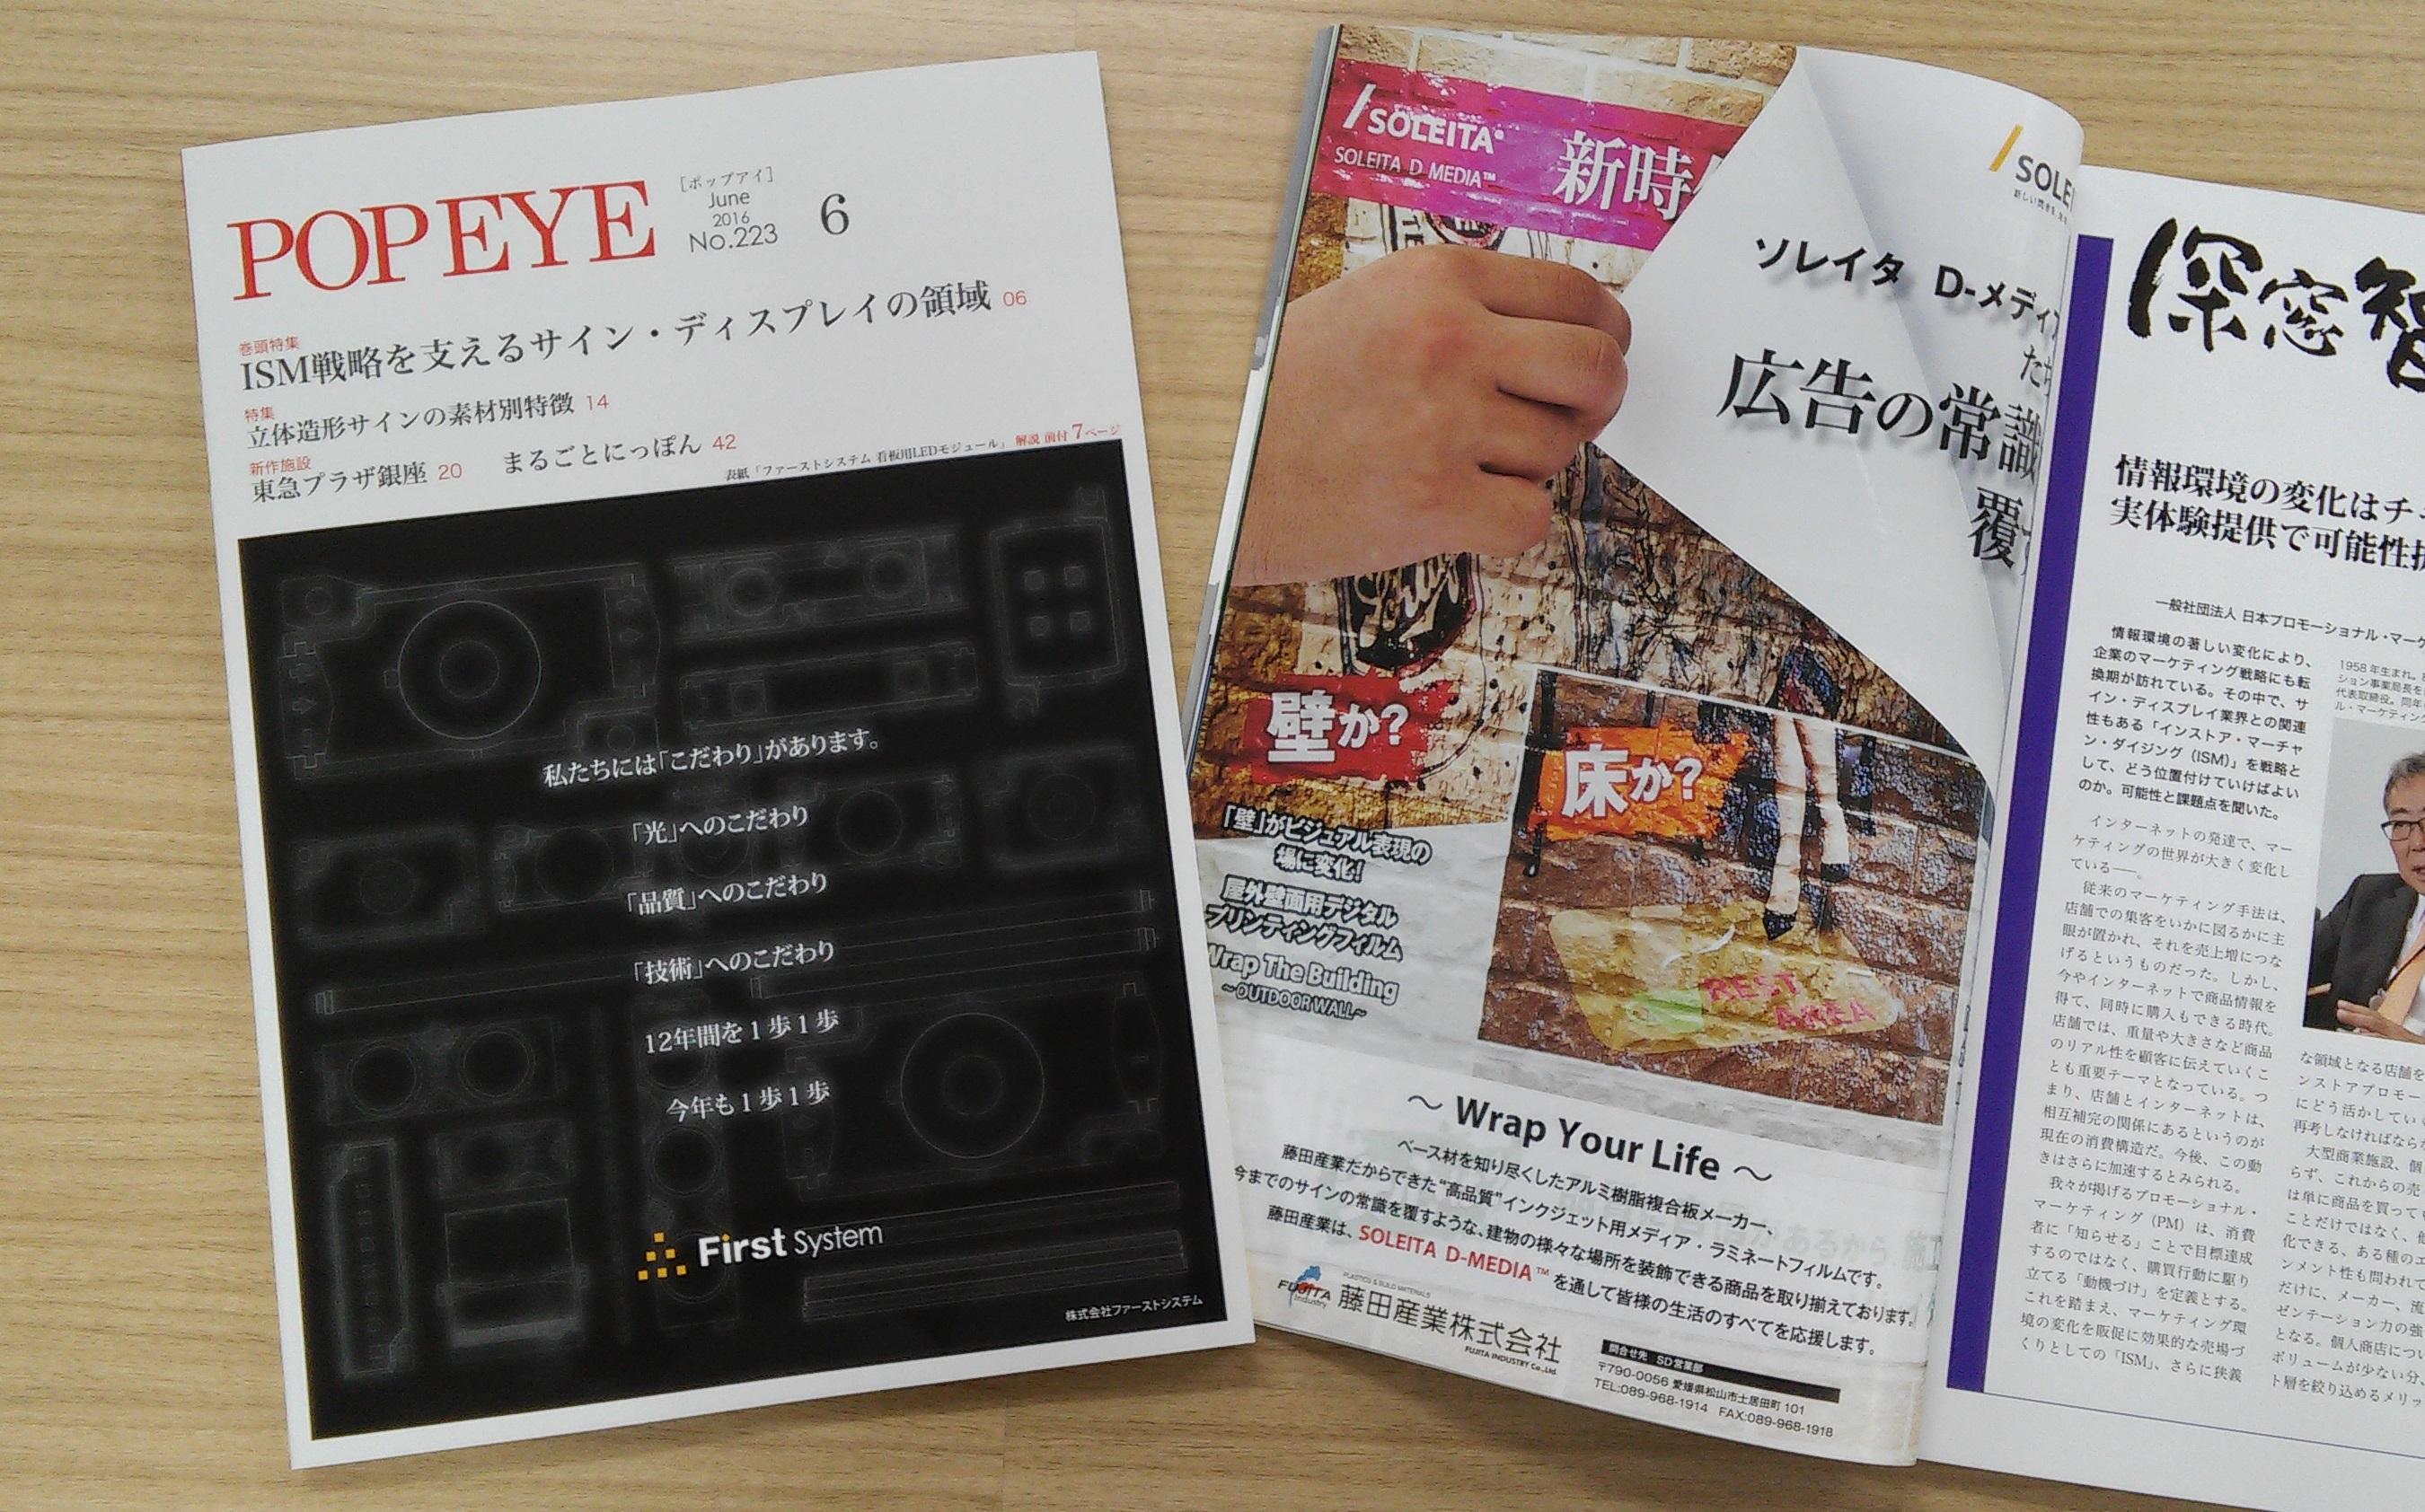 popeye_201606